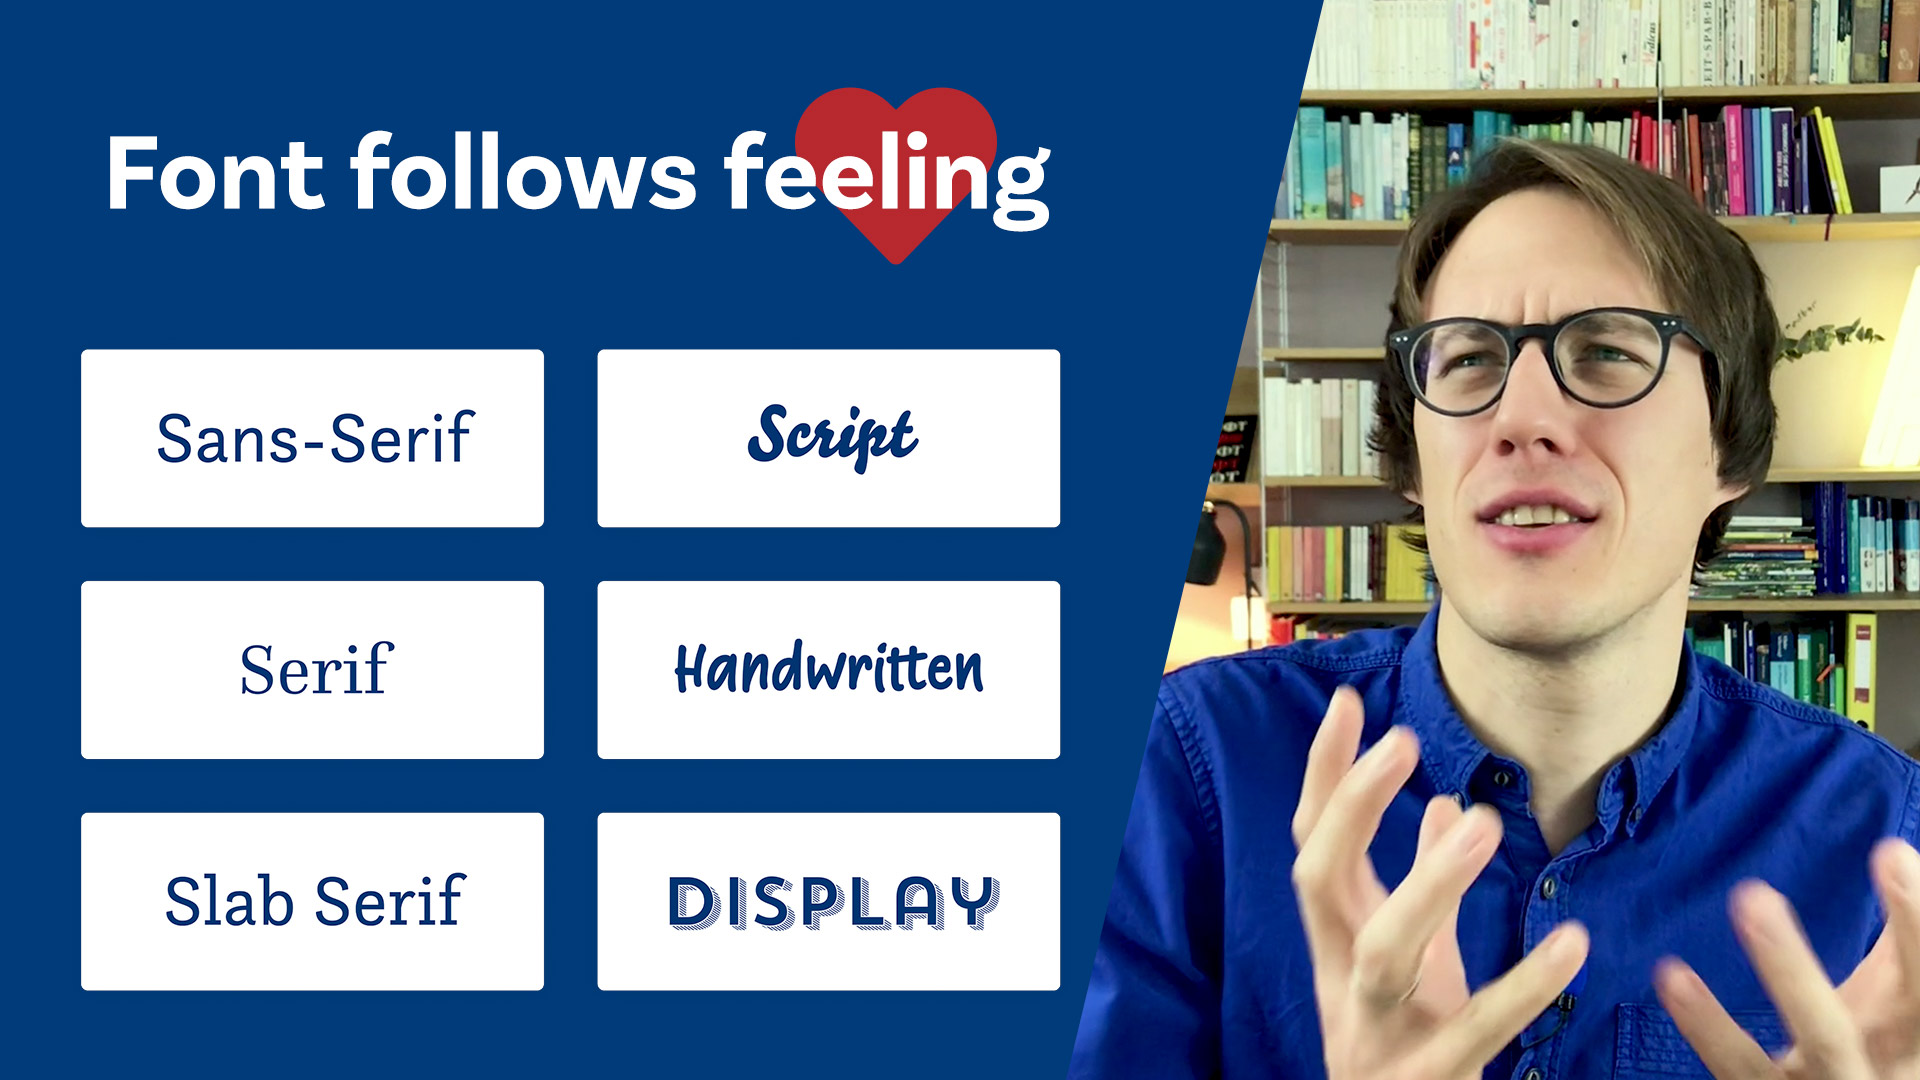 Font follows feeling